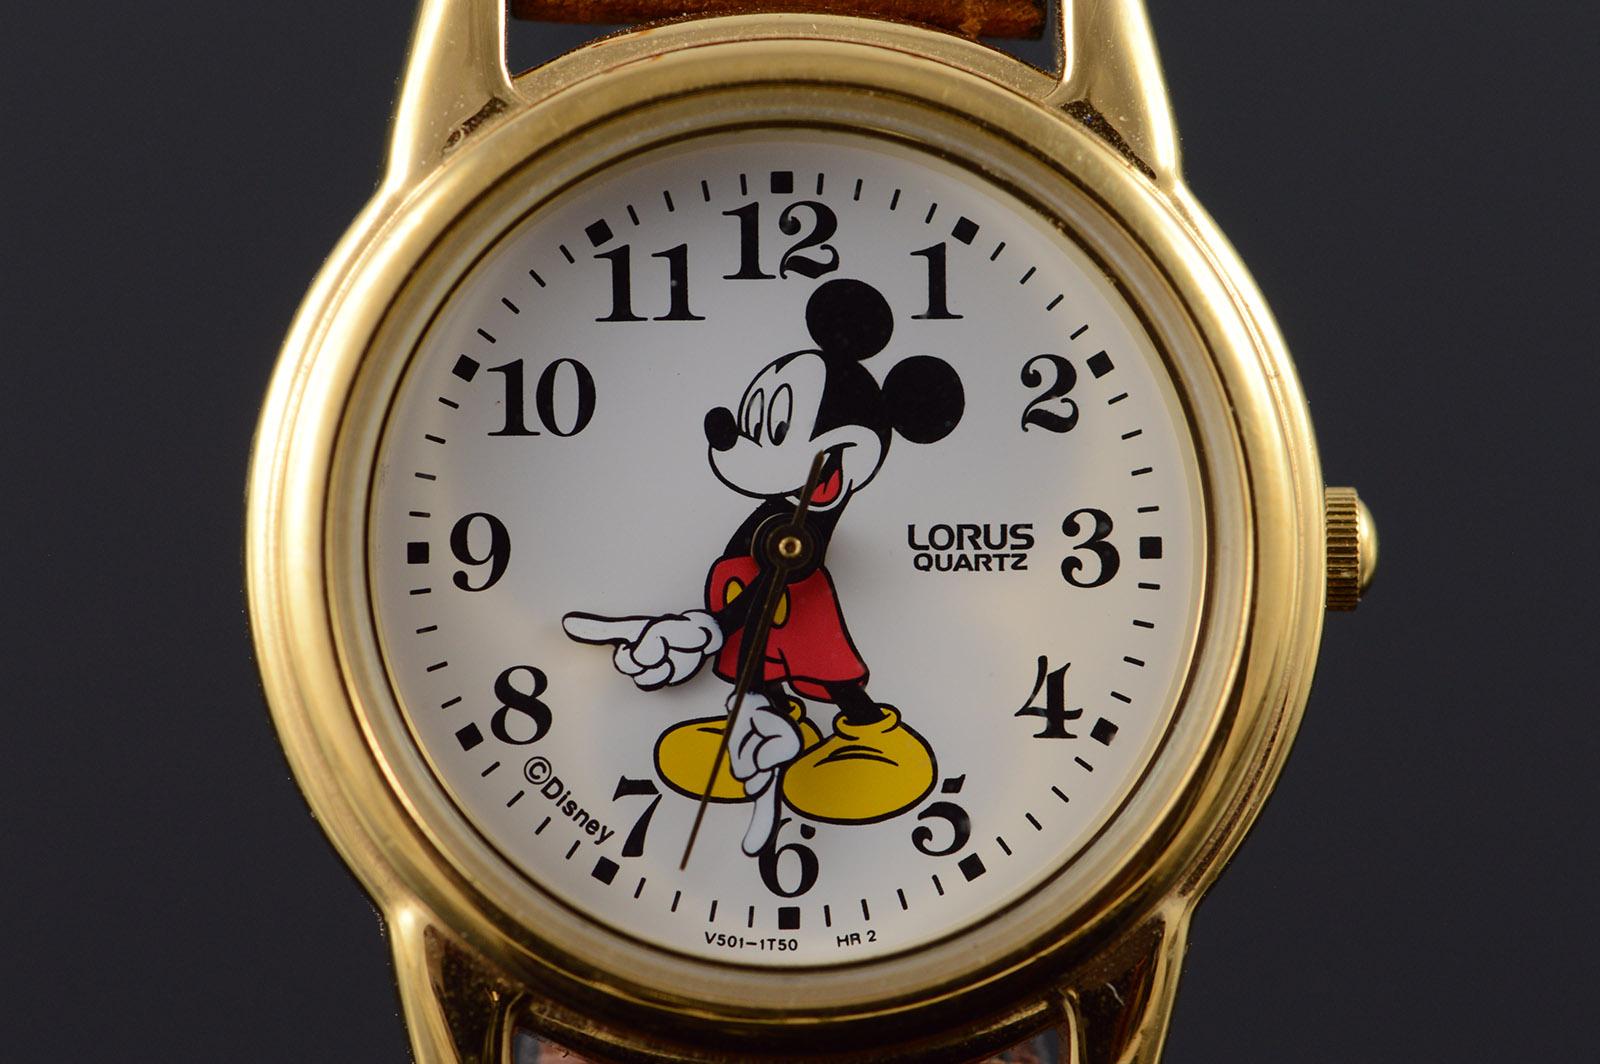 26mm Lorus Quartz Mickey Mouse Watch Women S Property Room